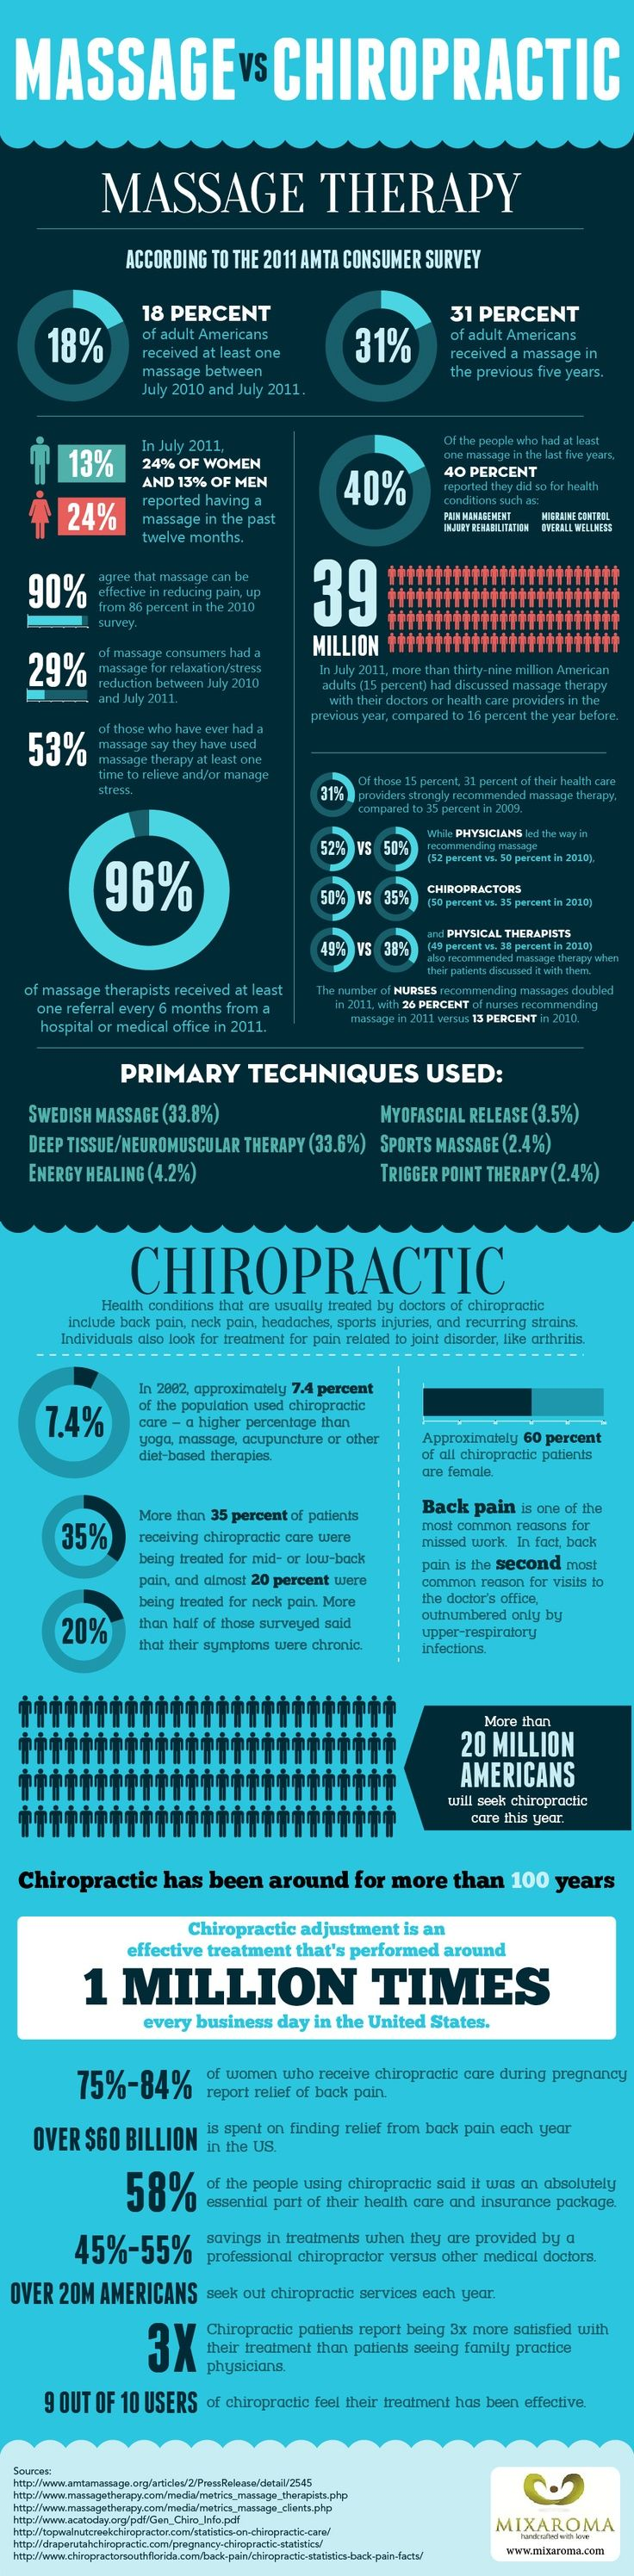 Infographic massage vs chiropractic firstcorvallis www